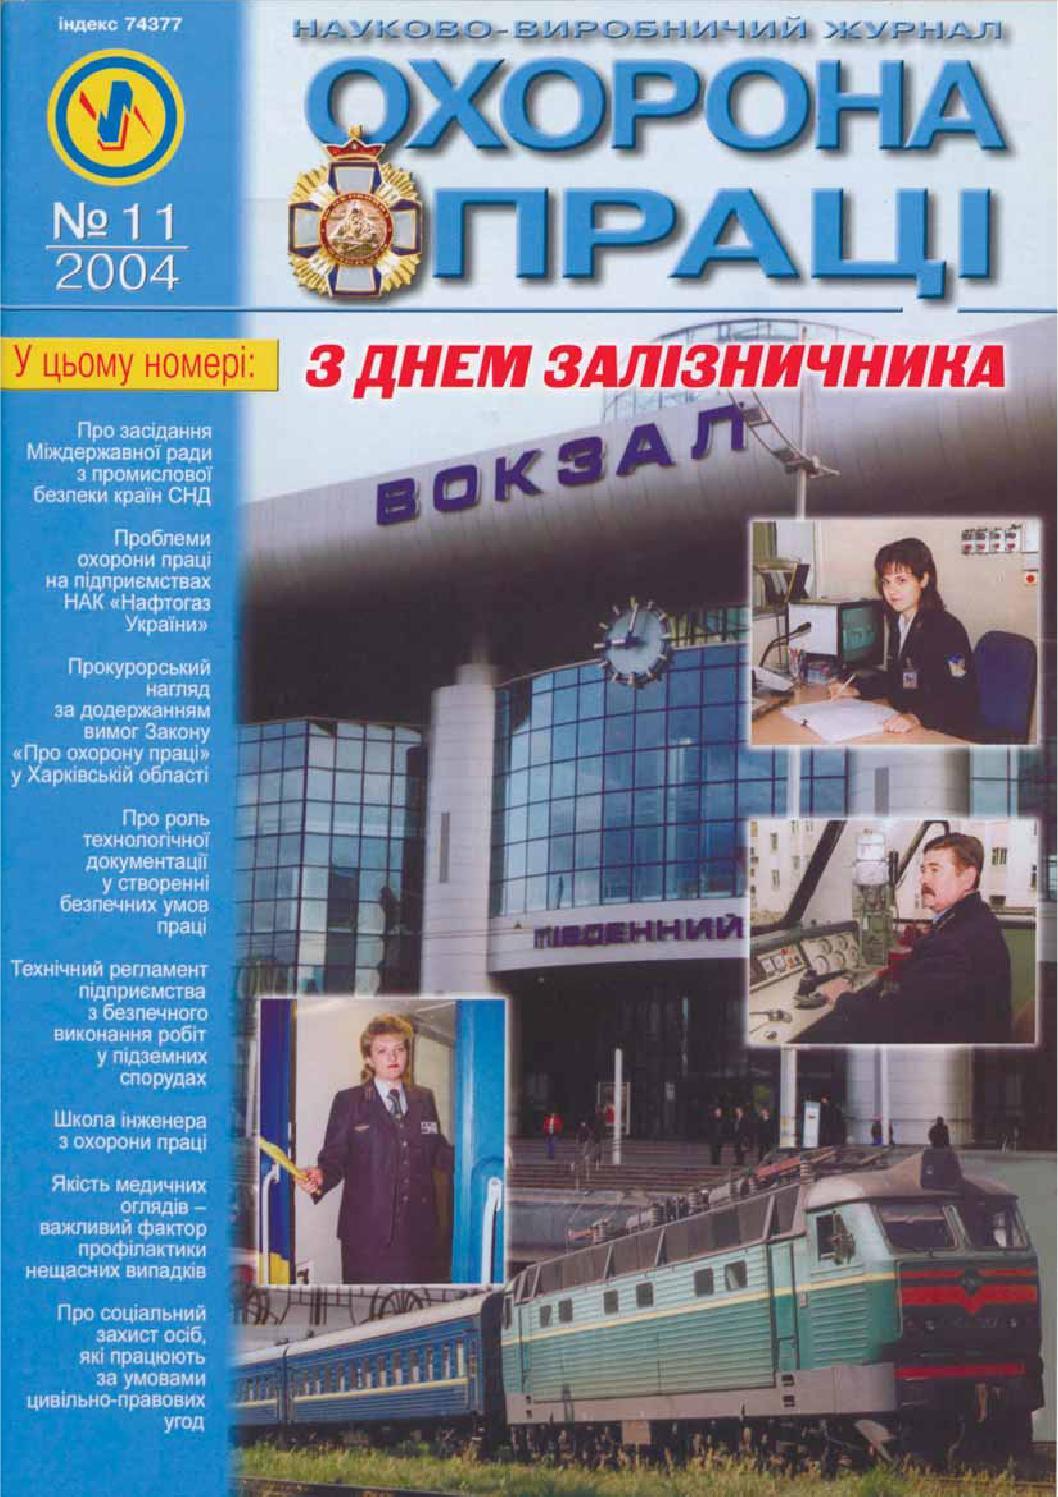 ohorona-pratsi-04-11 by Охрана труда - issuu 31948f7fc0aa4